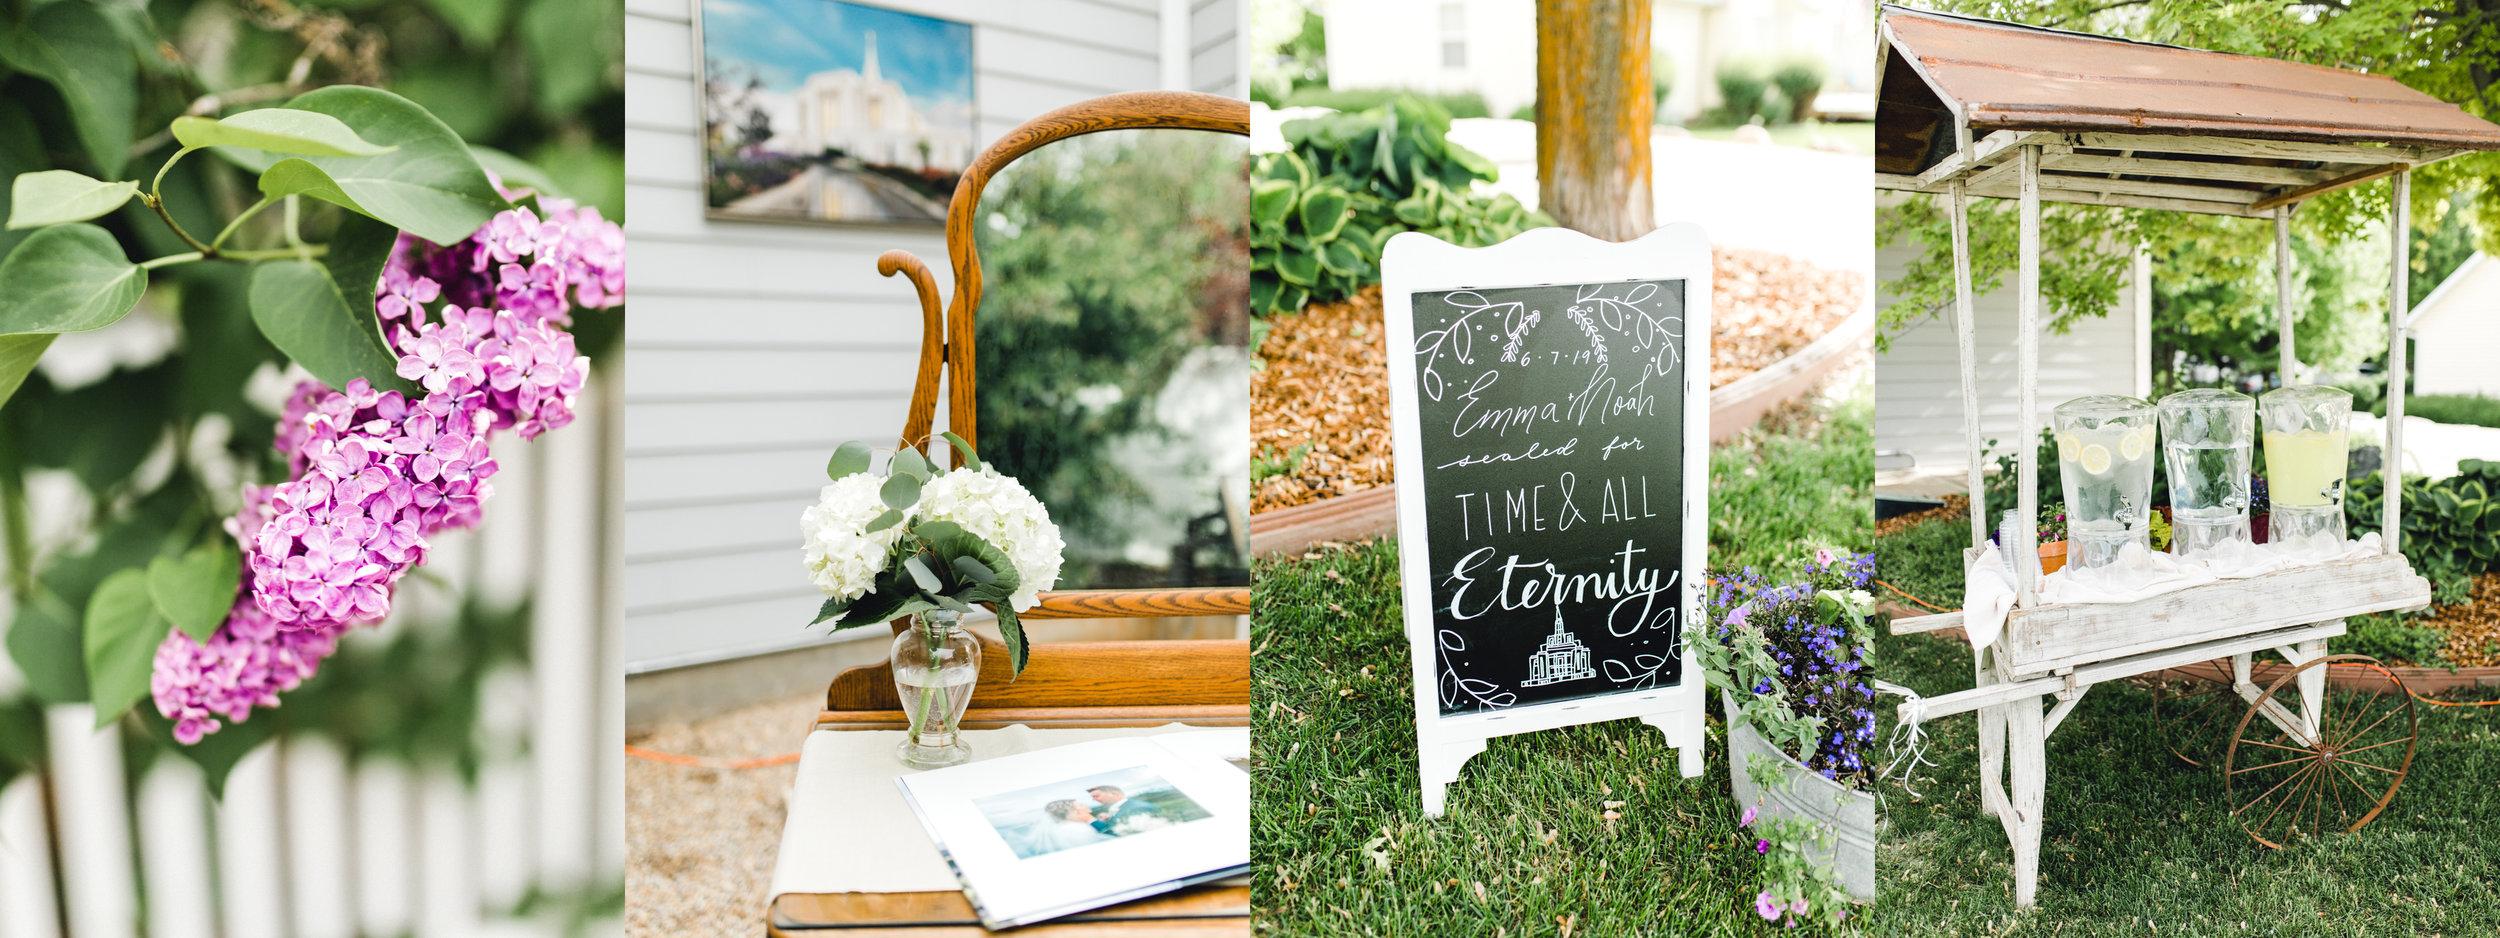 beautiful-outdoor-backyard-wedding-reception-anna-christine-photography-rexburg-idaho-13.jpg